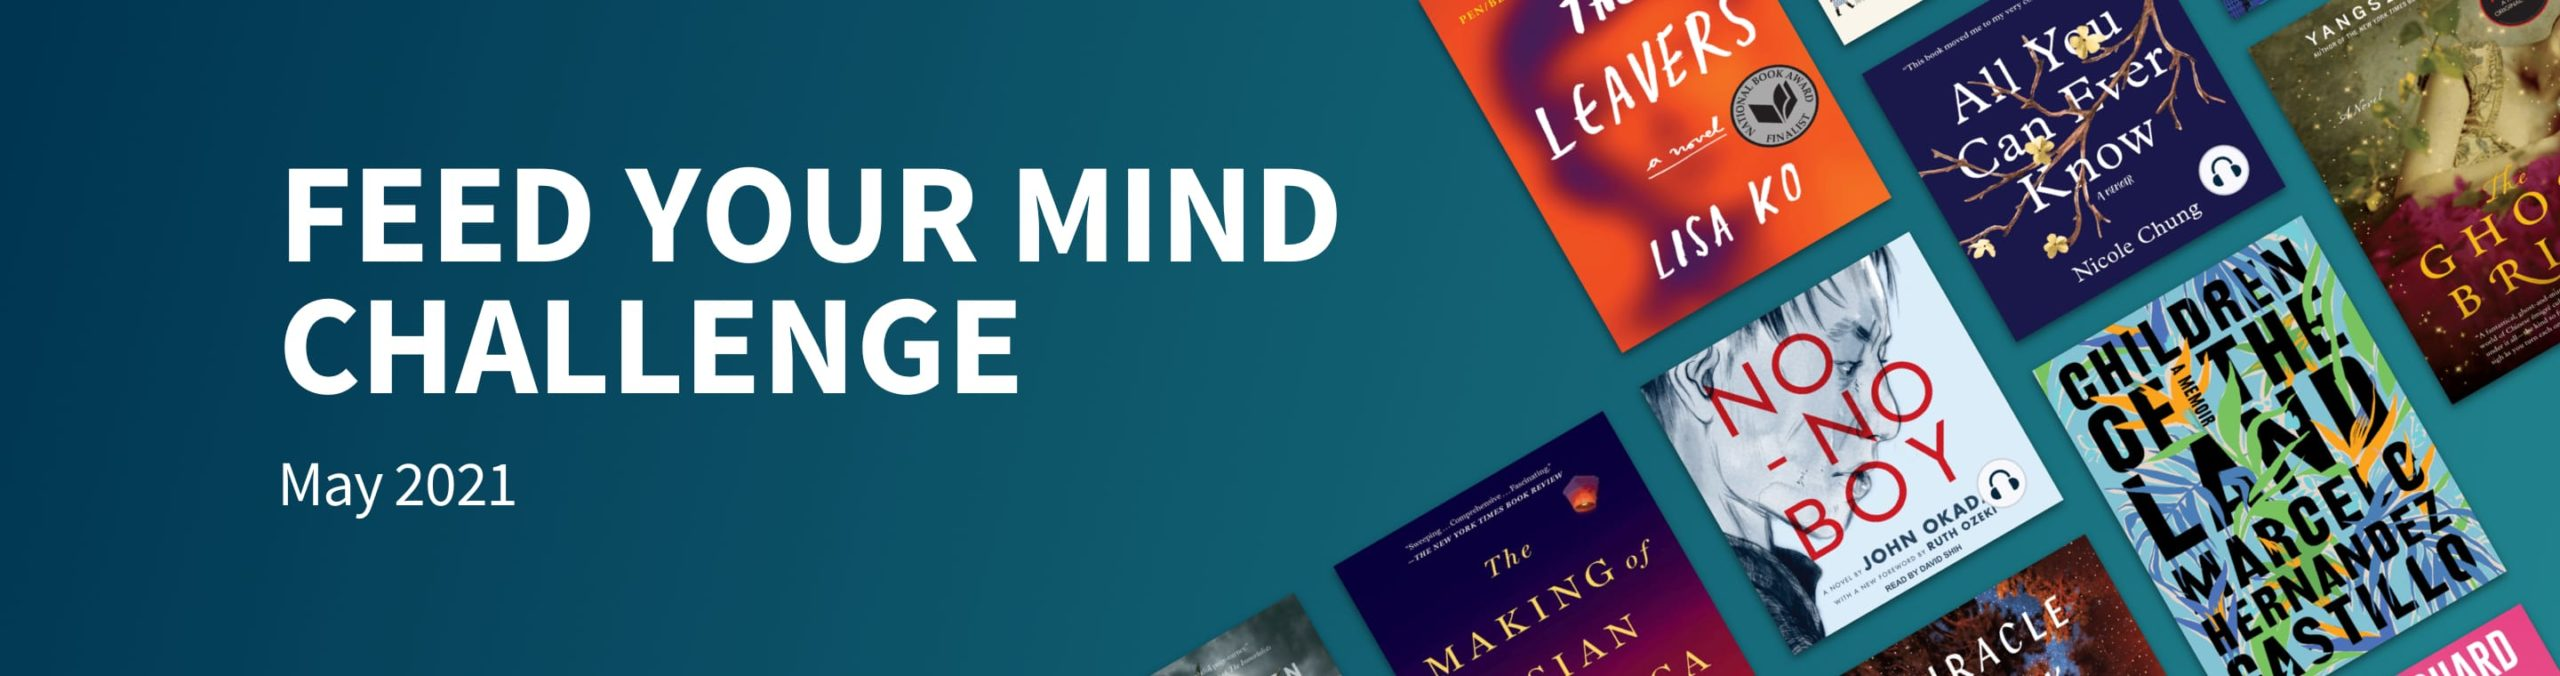 Scribd's May reading challenge